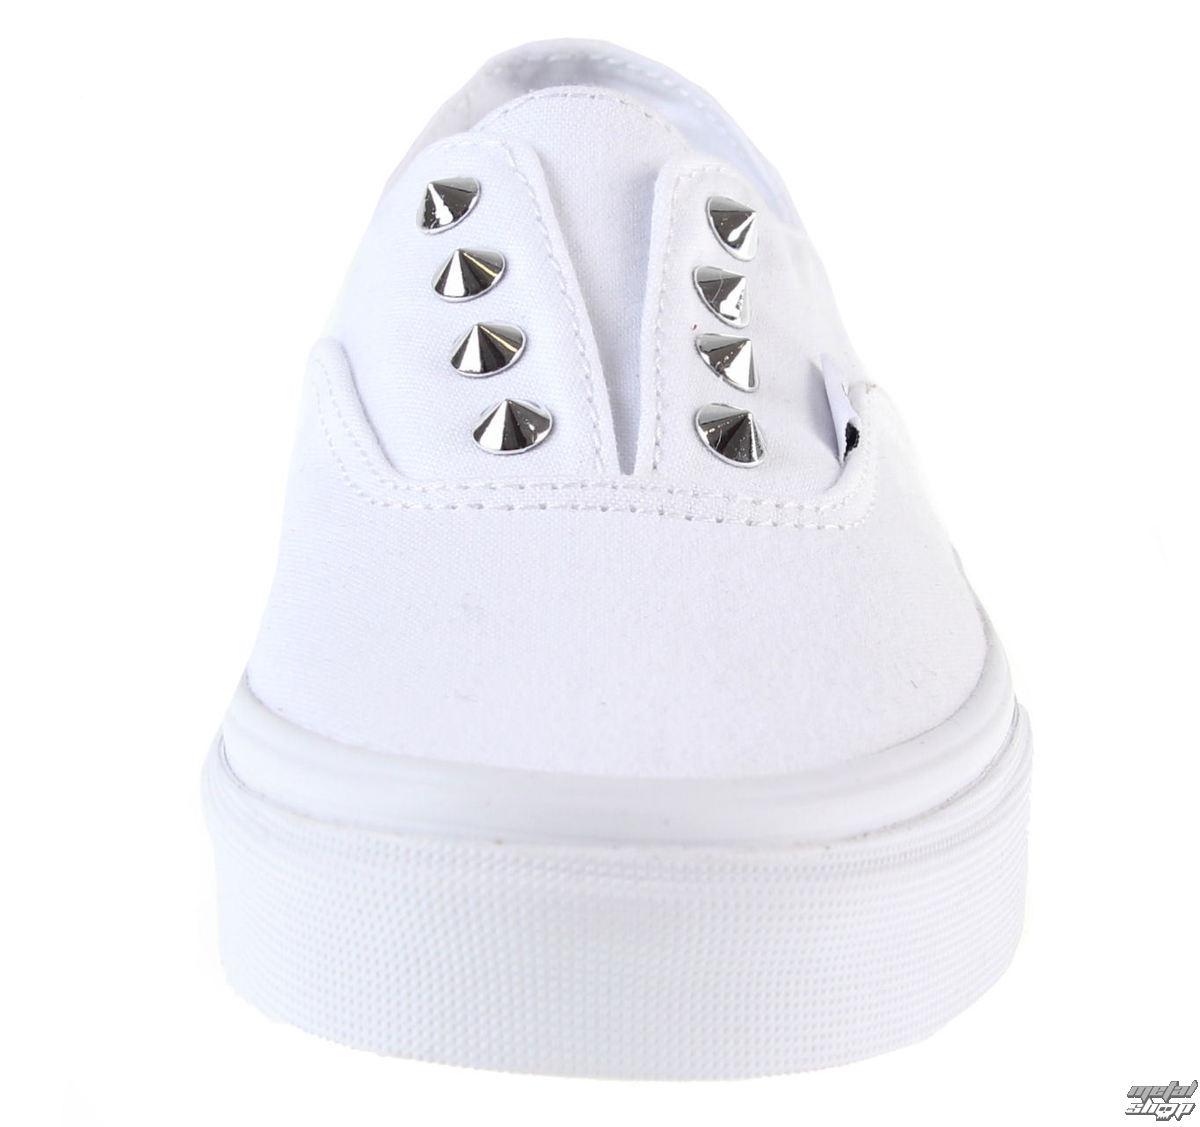 Details about NEW Vans Authentic Pineapple Skulls Skate Shoe